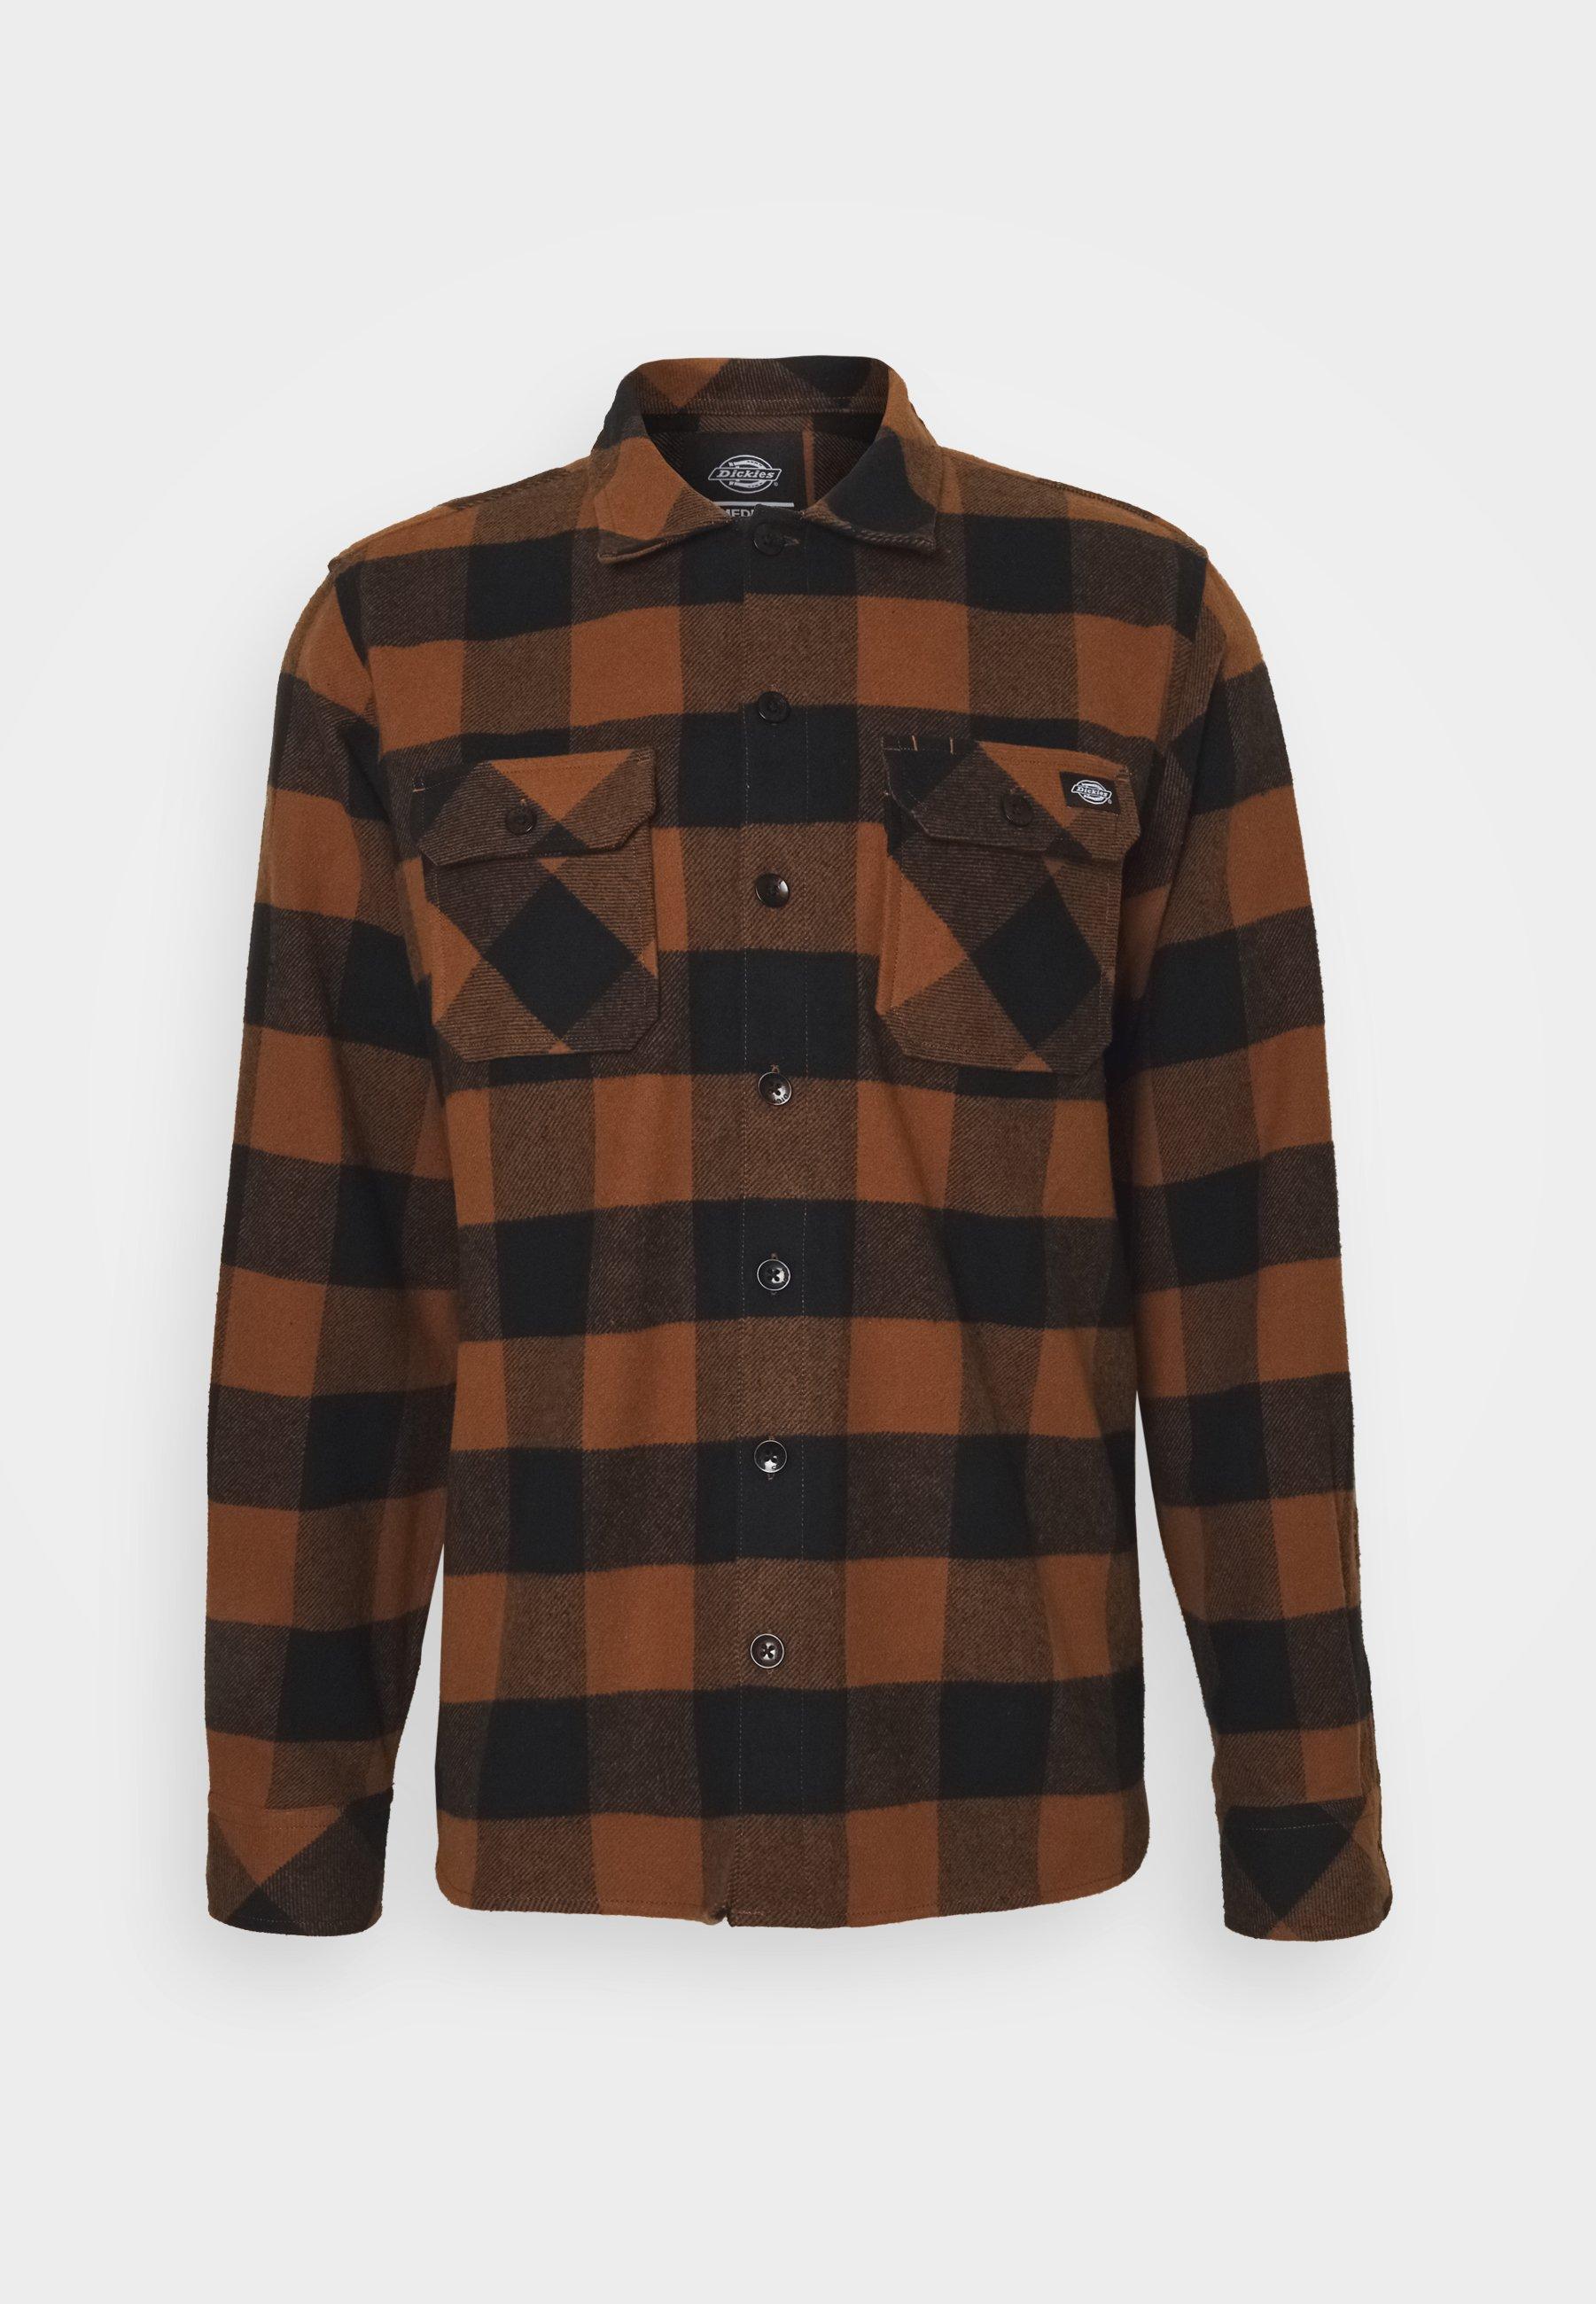 camicia uomo multicolore Dickies sacramento shirt brown duck